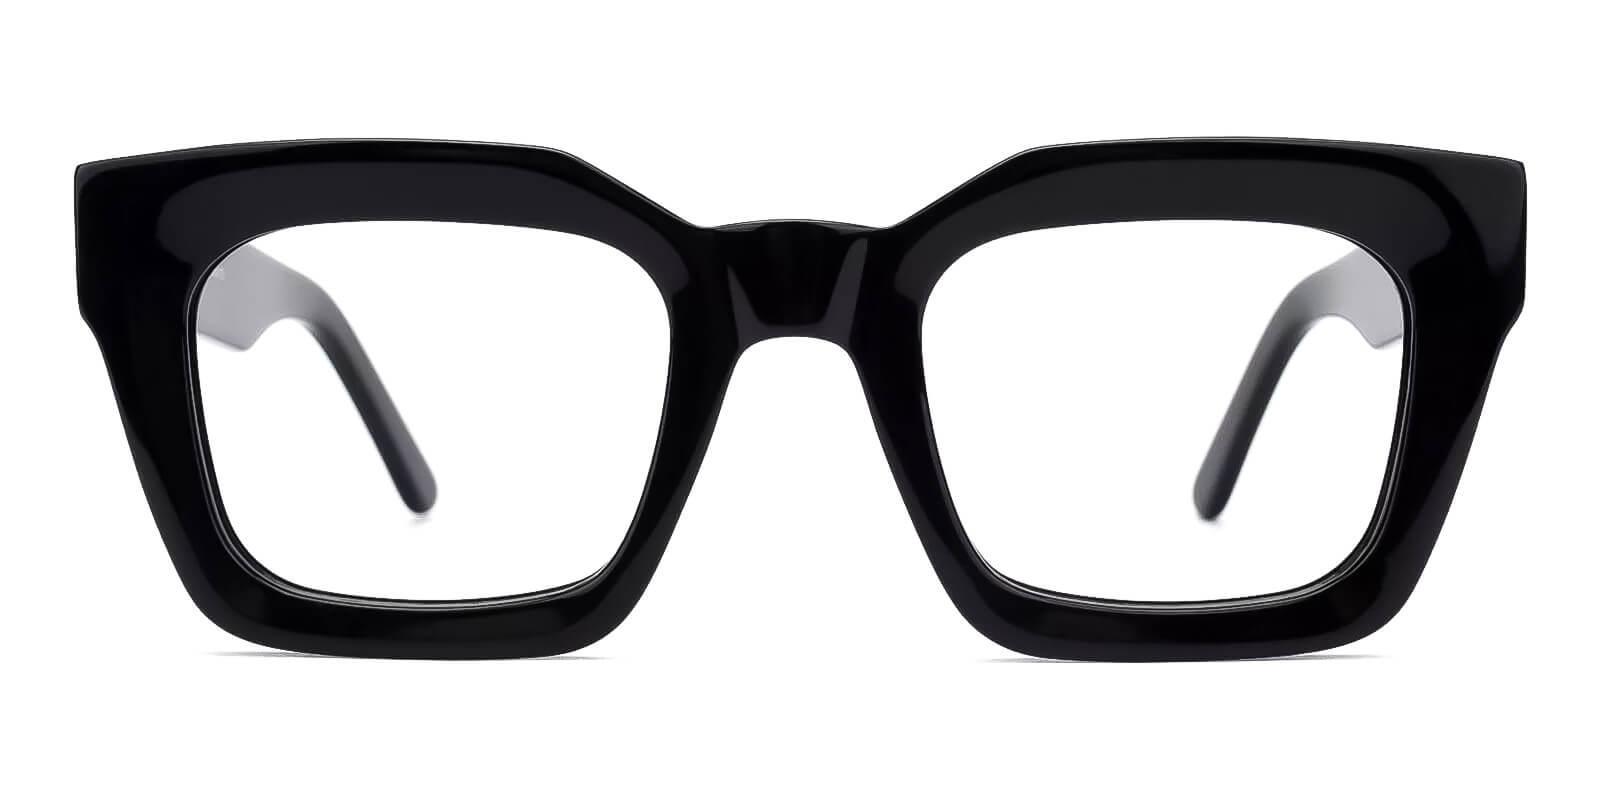 Cloud Black Acetate Eyeglasses , Fashion , UniversalBridgeFit Frames from ABBE Glasses